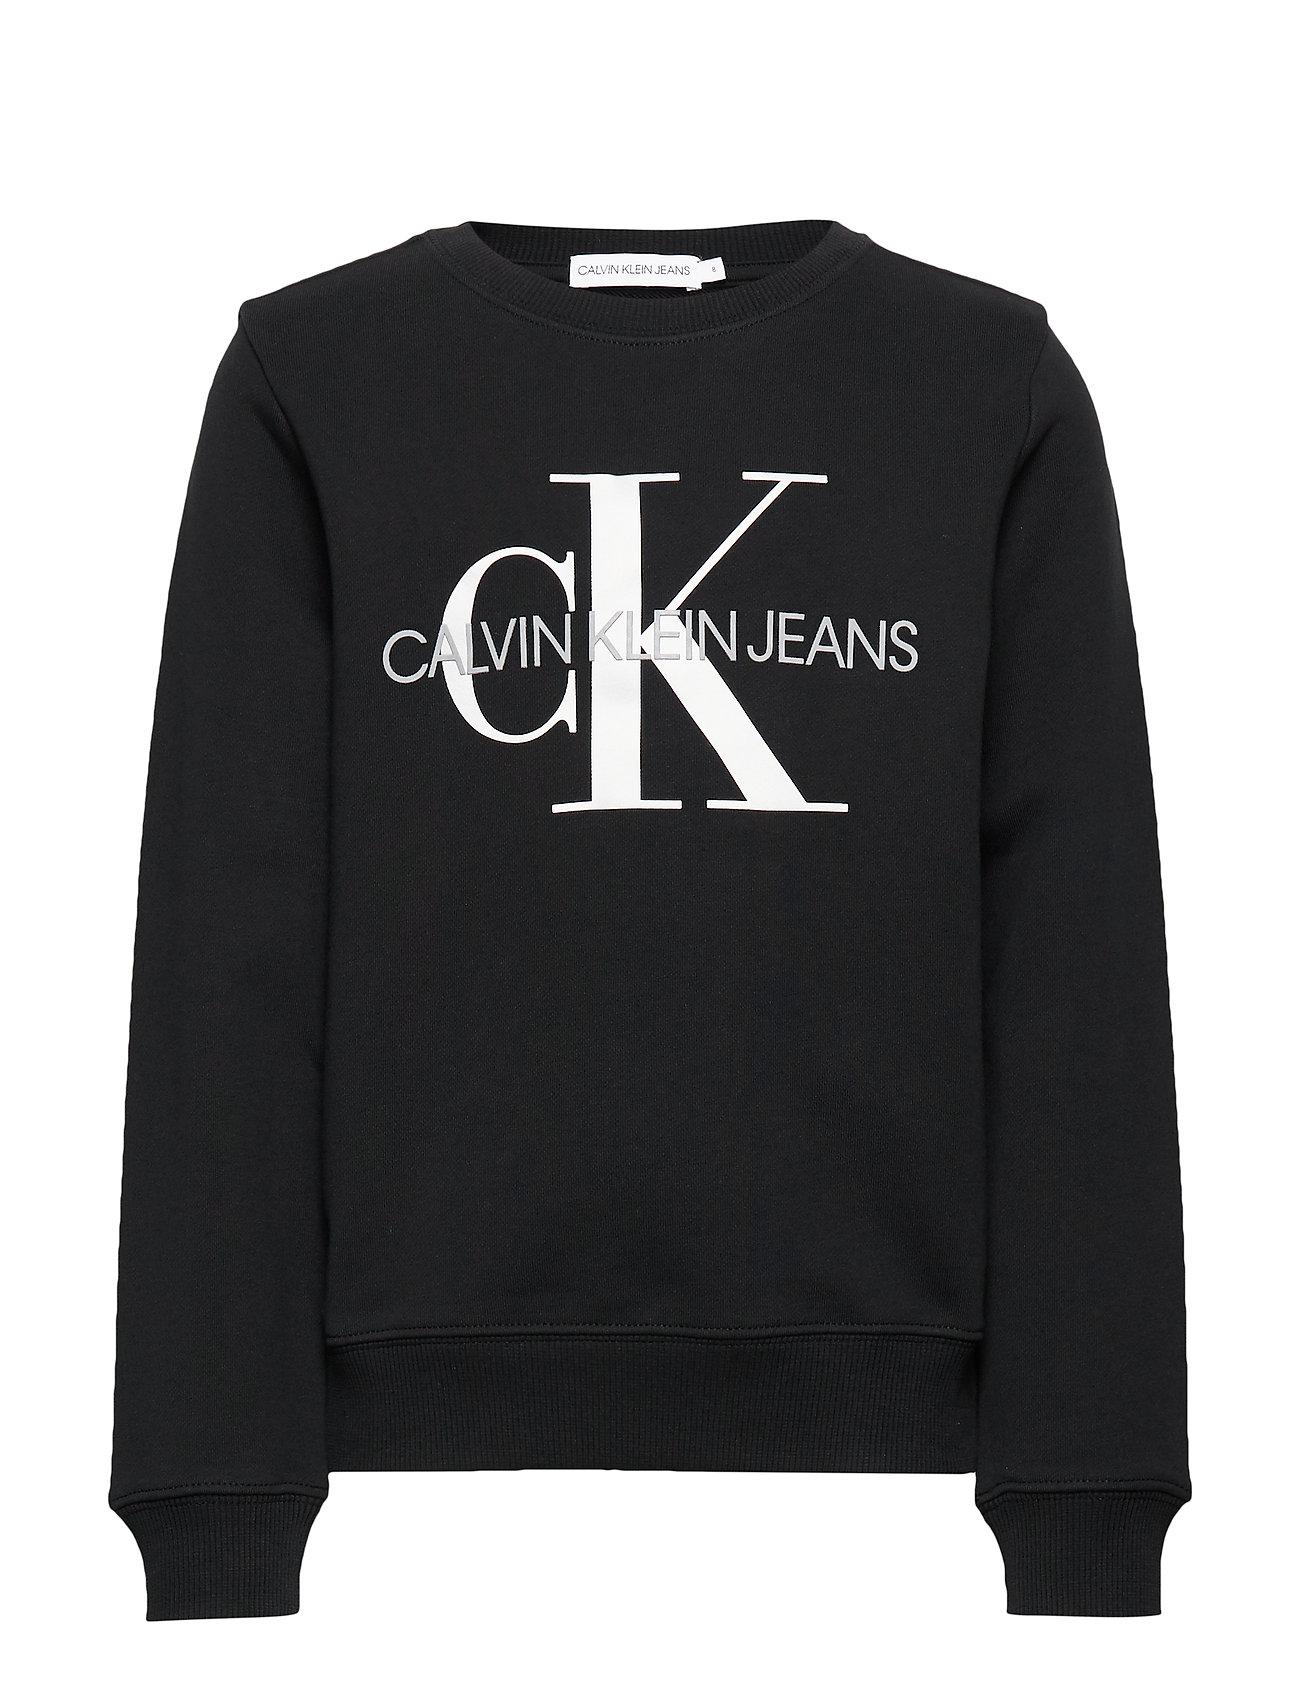 Calvin Klein MONOGRAM LOGO SWEATSHIRT - CK BLACK